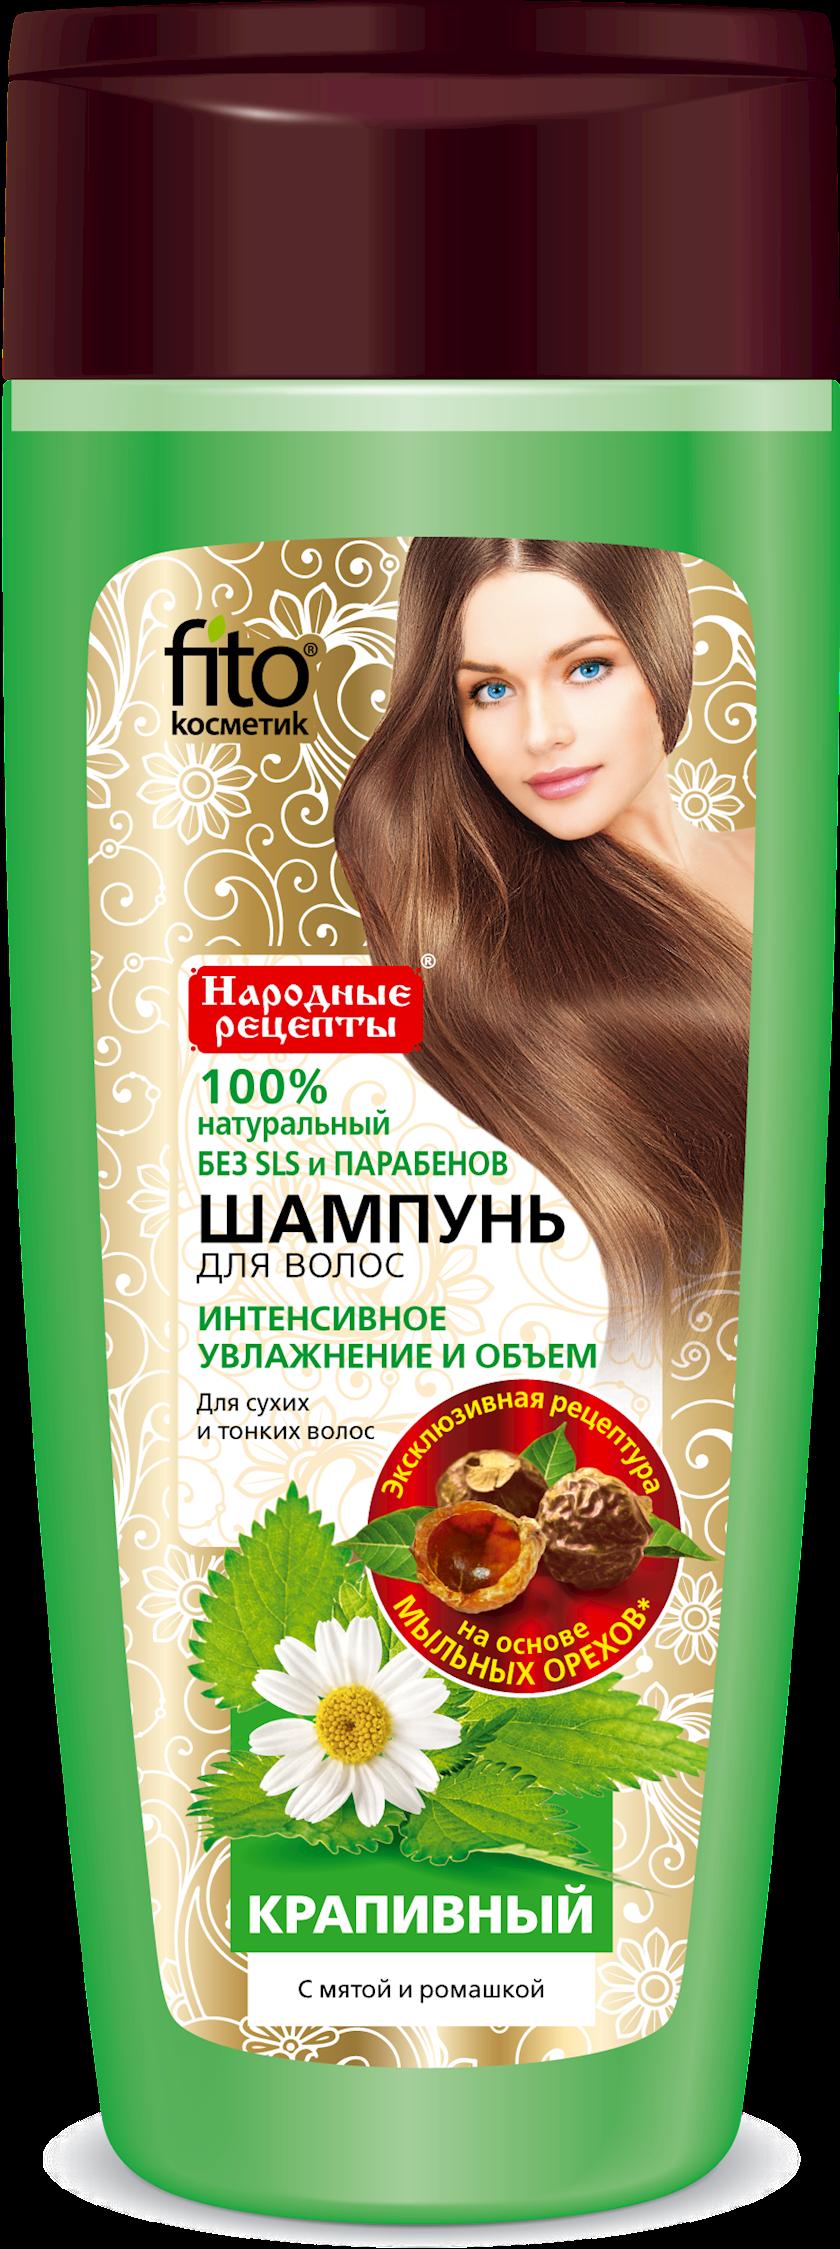 Şampun Фитокосметик Народные Рецепты Gicitkənli 270 ml